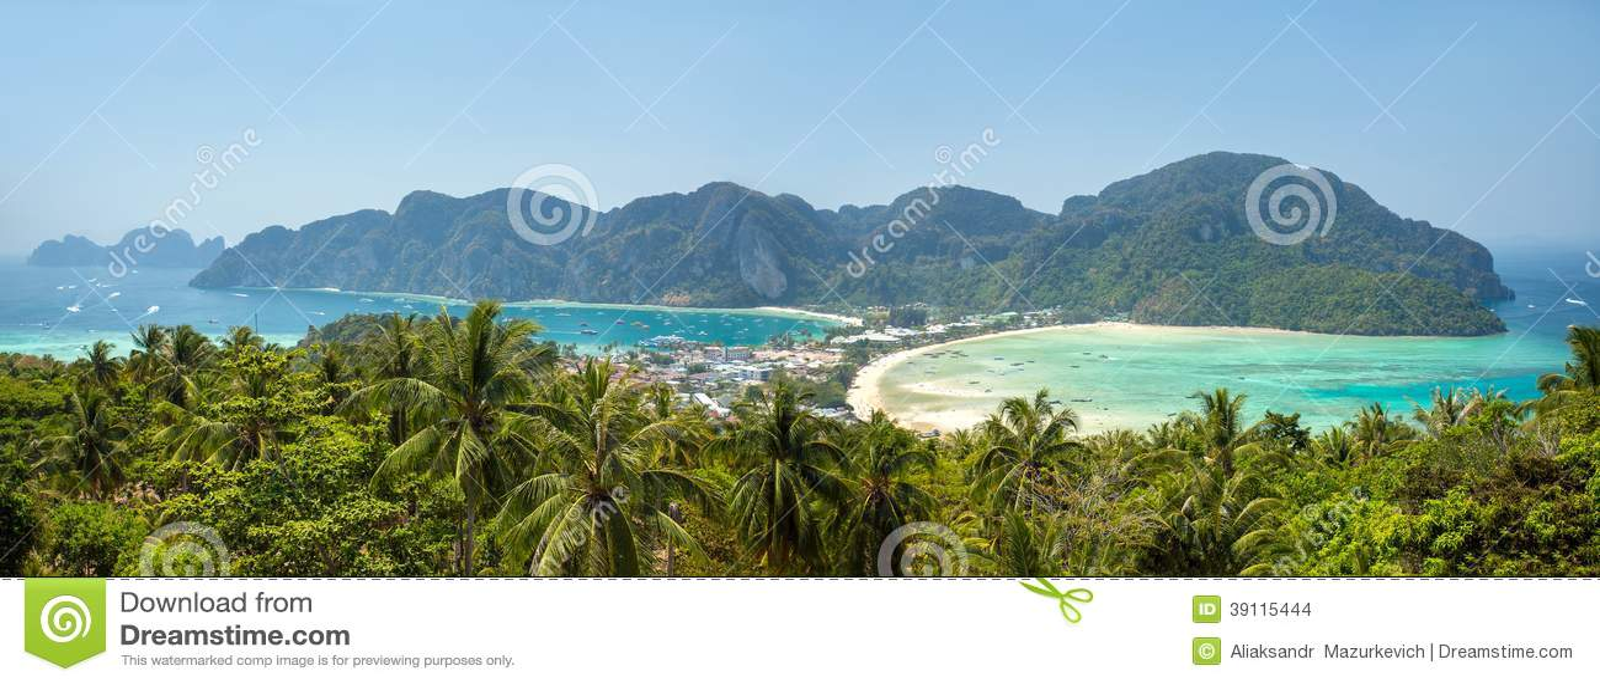 Phi-Phi eiland, Krabi-Provincie, Thailand. Panorama